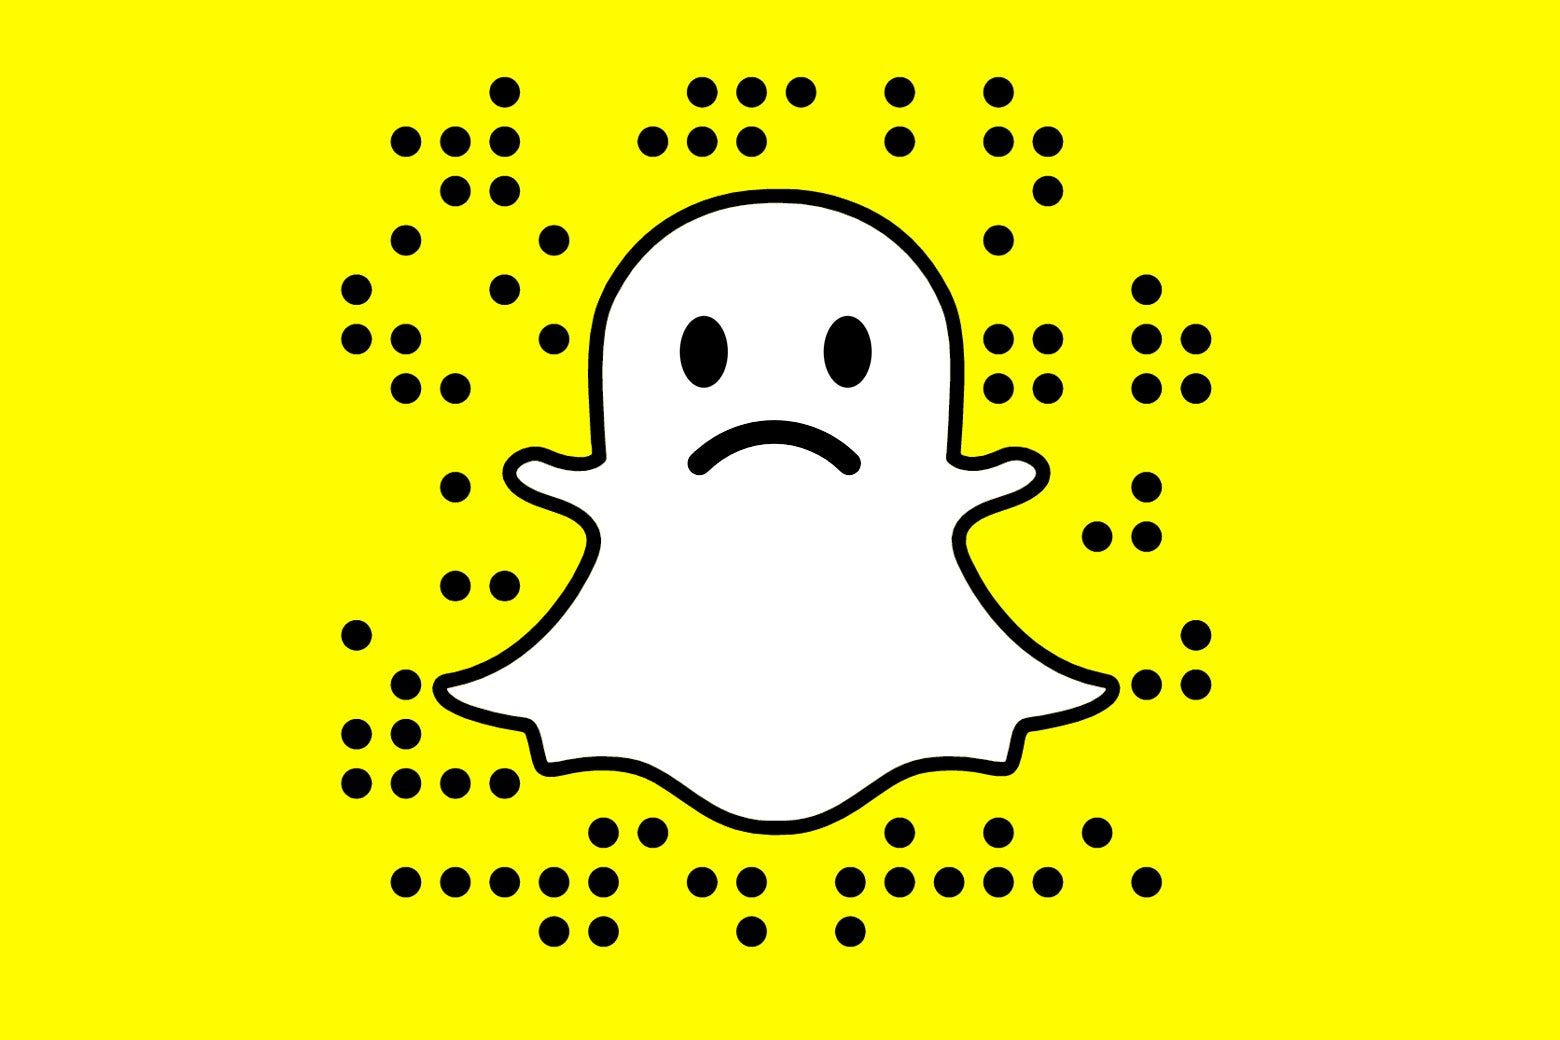 A sad Snapchat ghost.